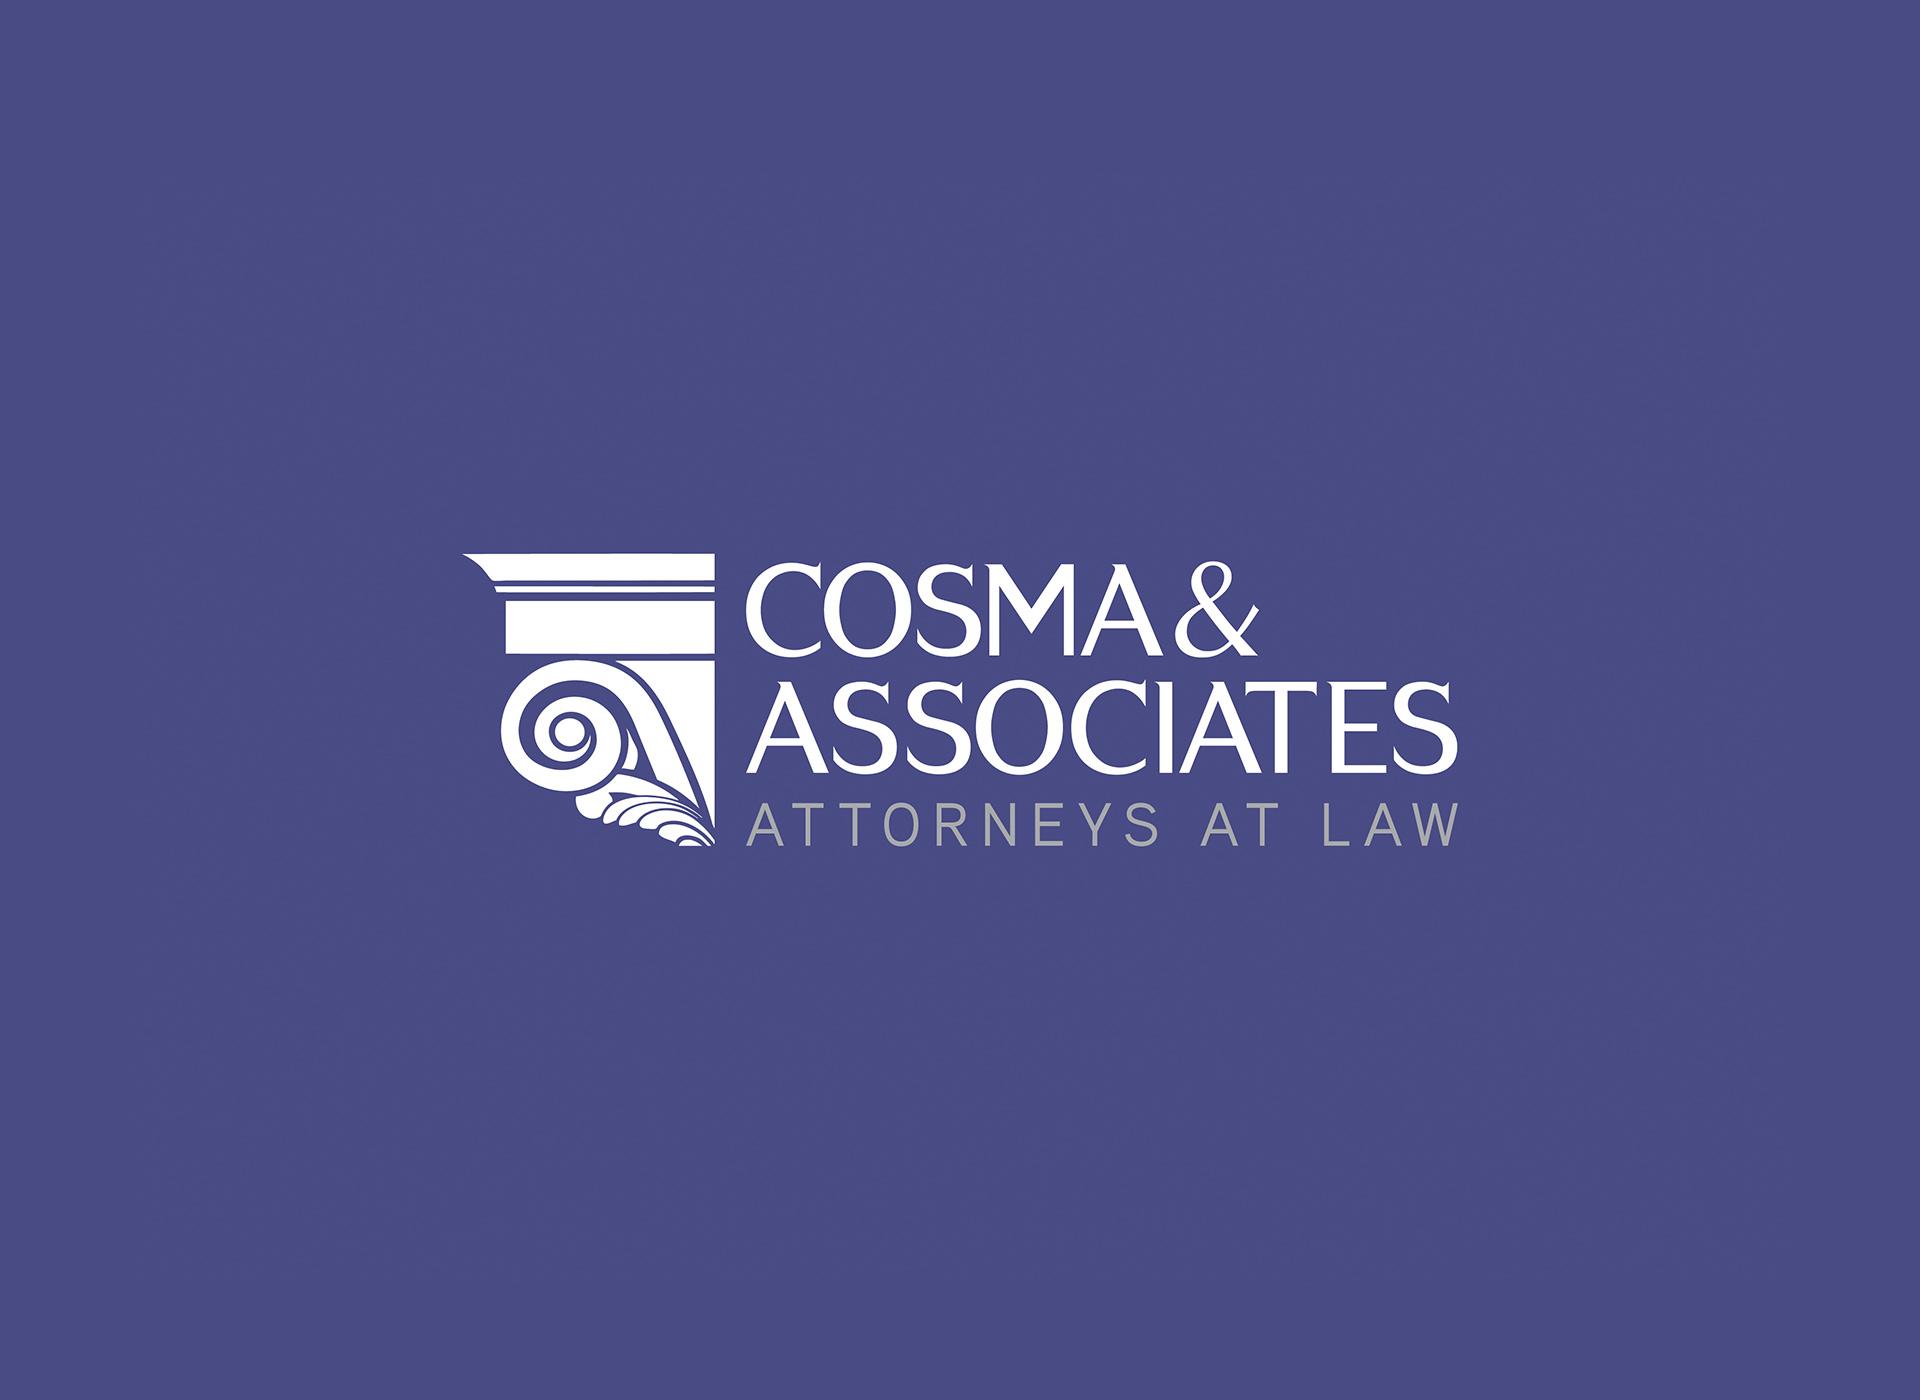 Cosma Associates